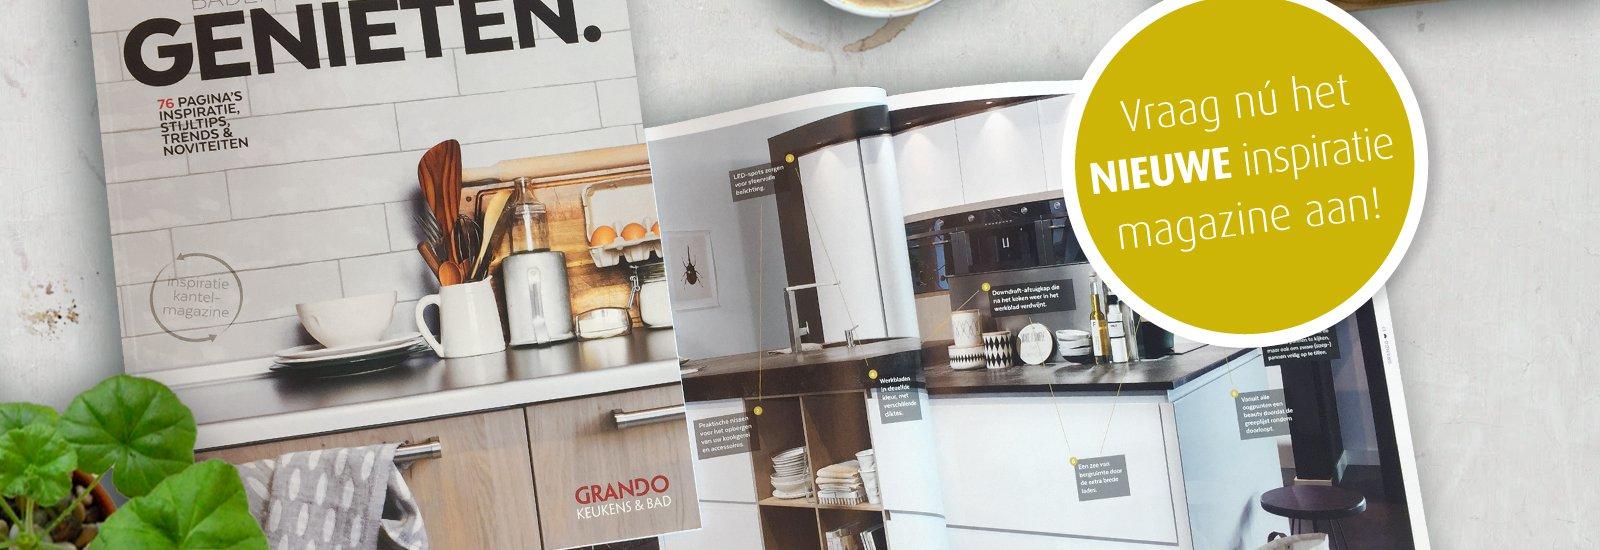 Grando Keuken en Badkamer inspiratie magazine. Gratis keukenmagazine met inspiratie, tips en binnenkijkers #keuken #keukeninspiratie #magazine